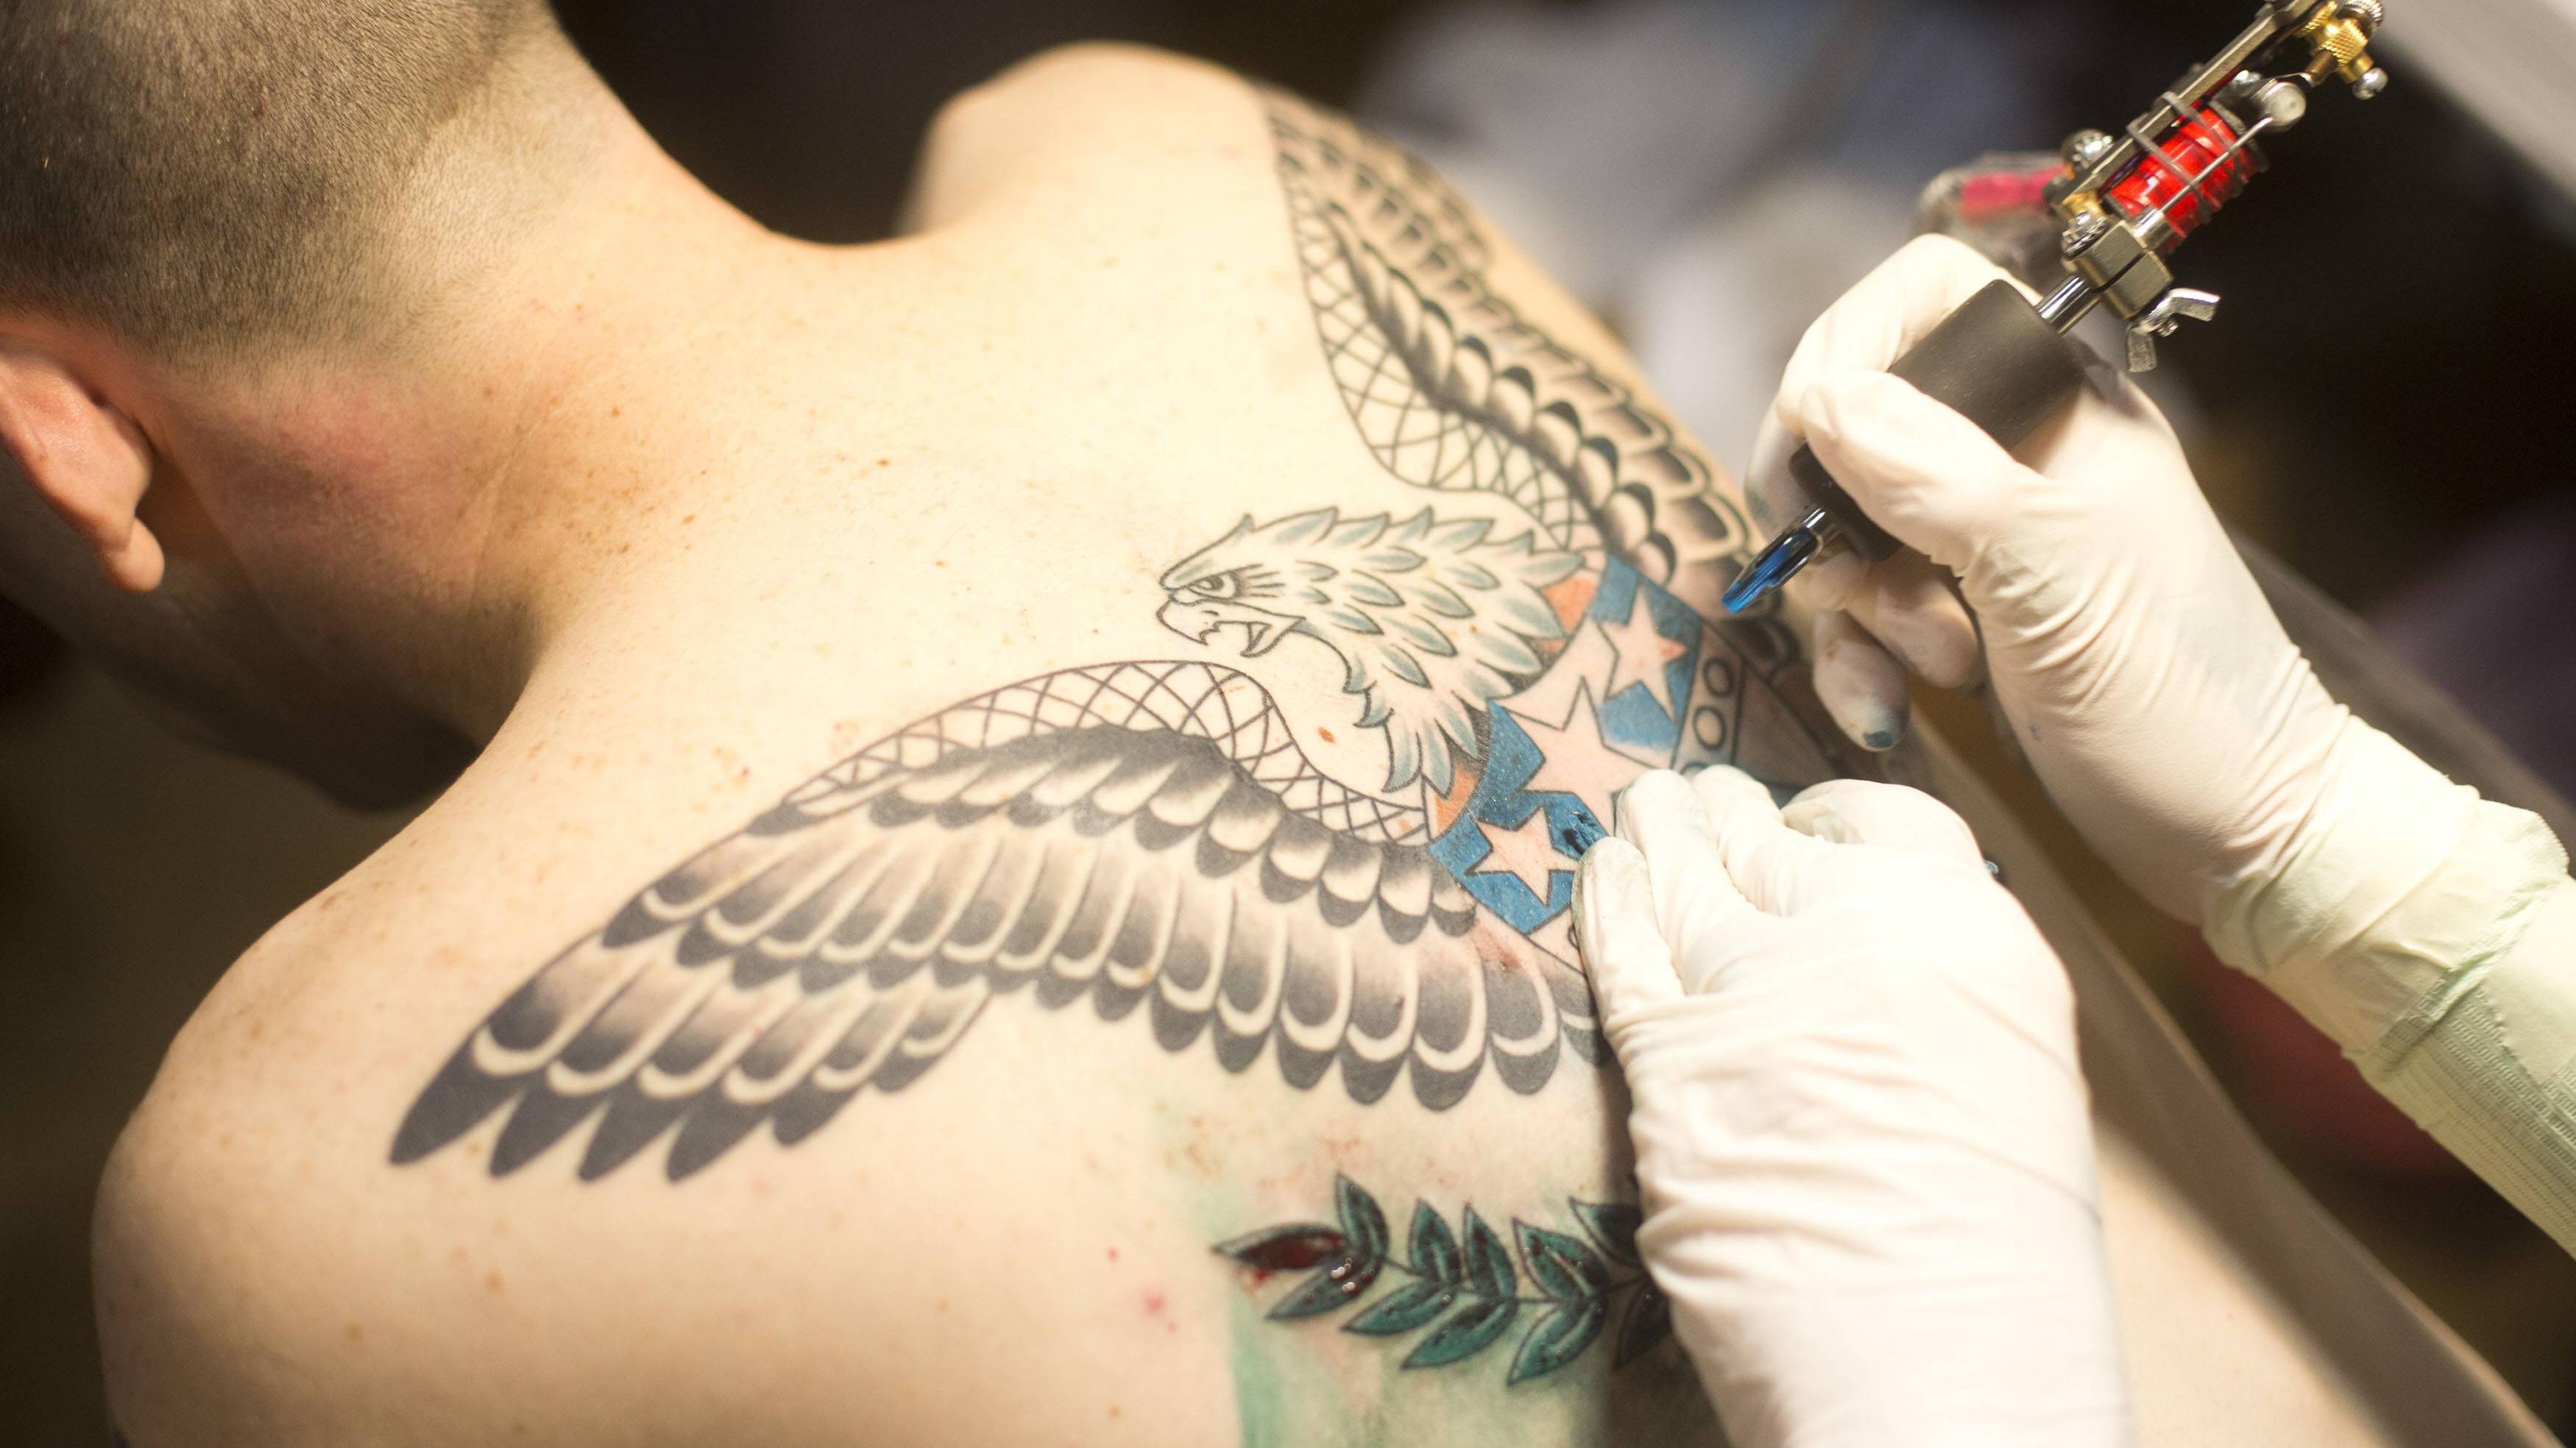 Bedeutung engelsflügel tattoo Engelsflügel tattoo